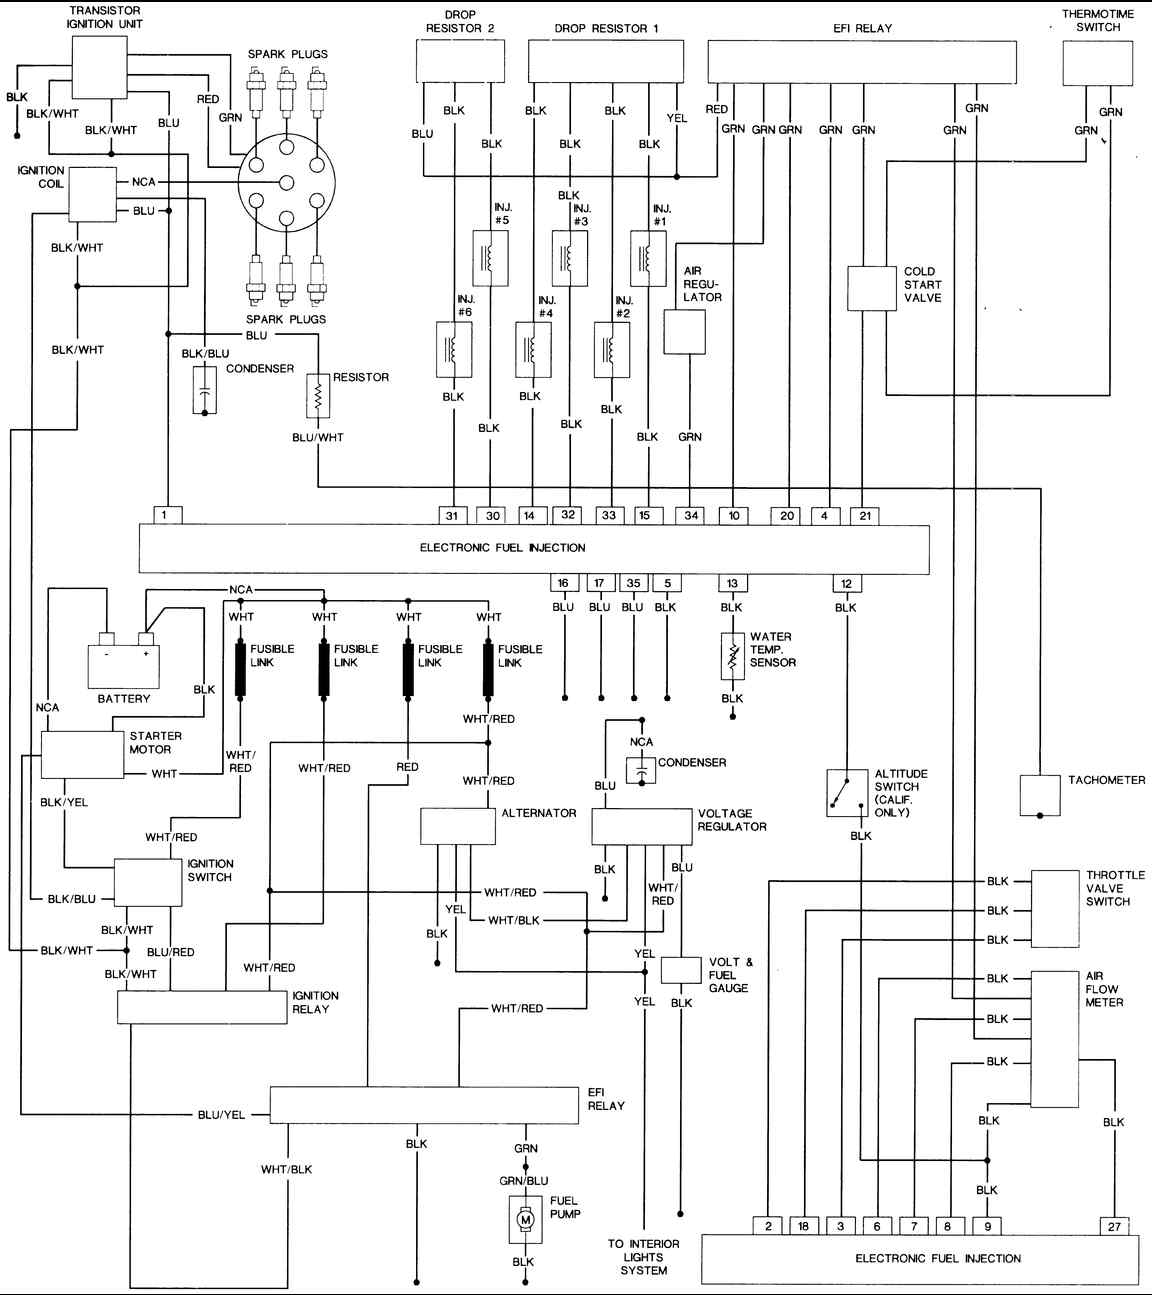 280zx Wiring Diagram Cas 2003 Gmc 5 3 Engine Diagram 1994 Chevys Kankubuktikan Jeanjaures37 Fr